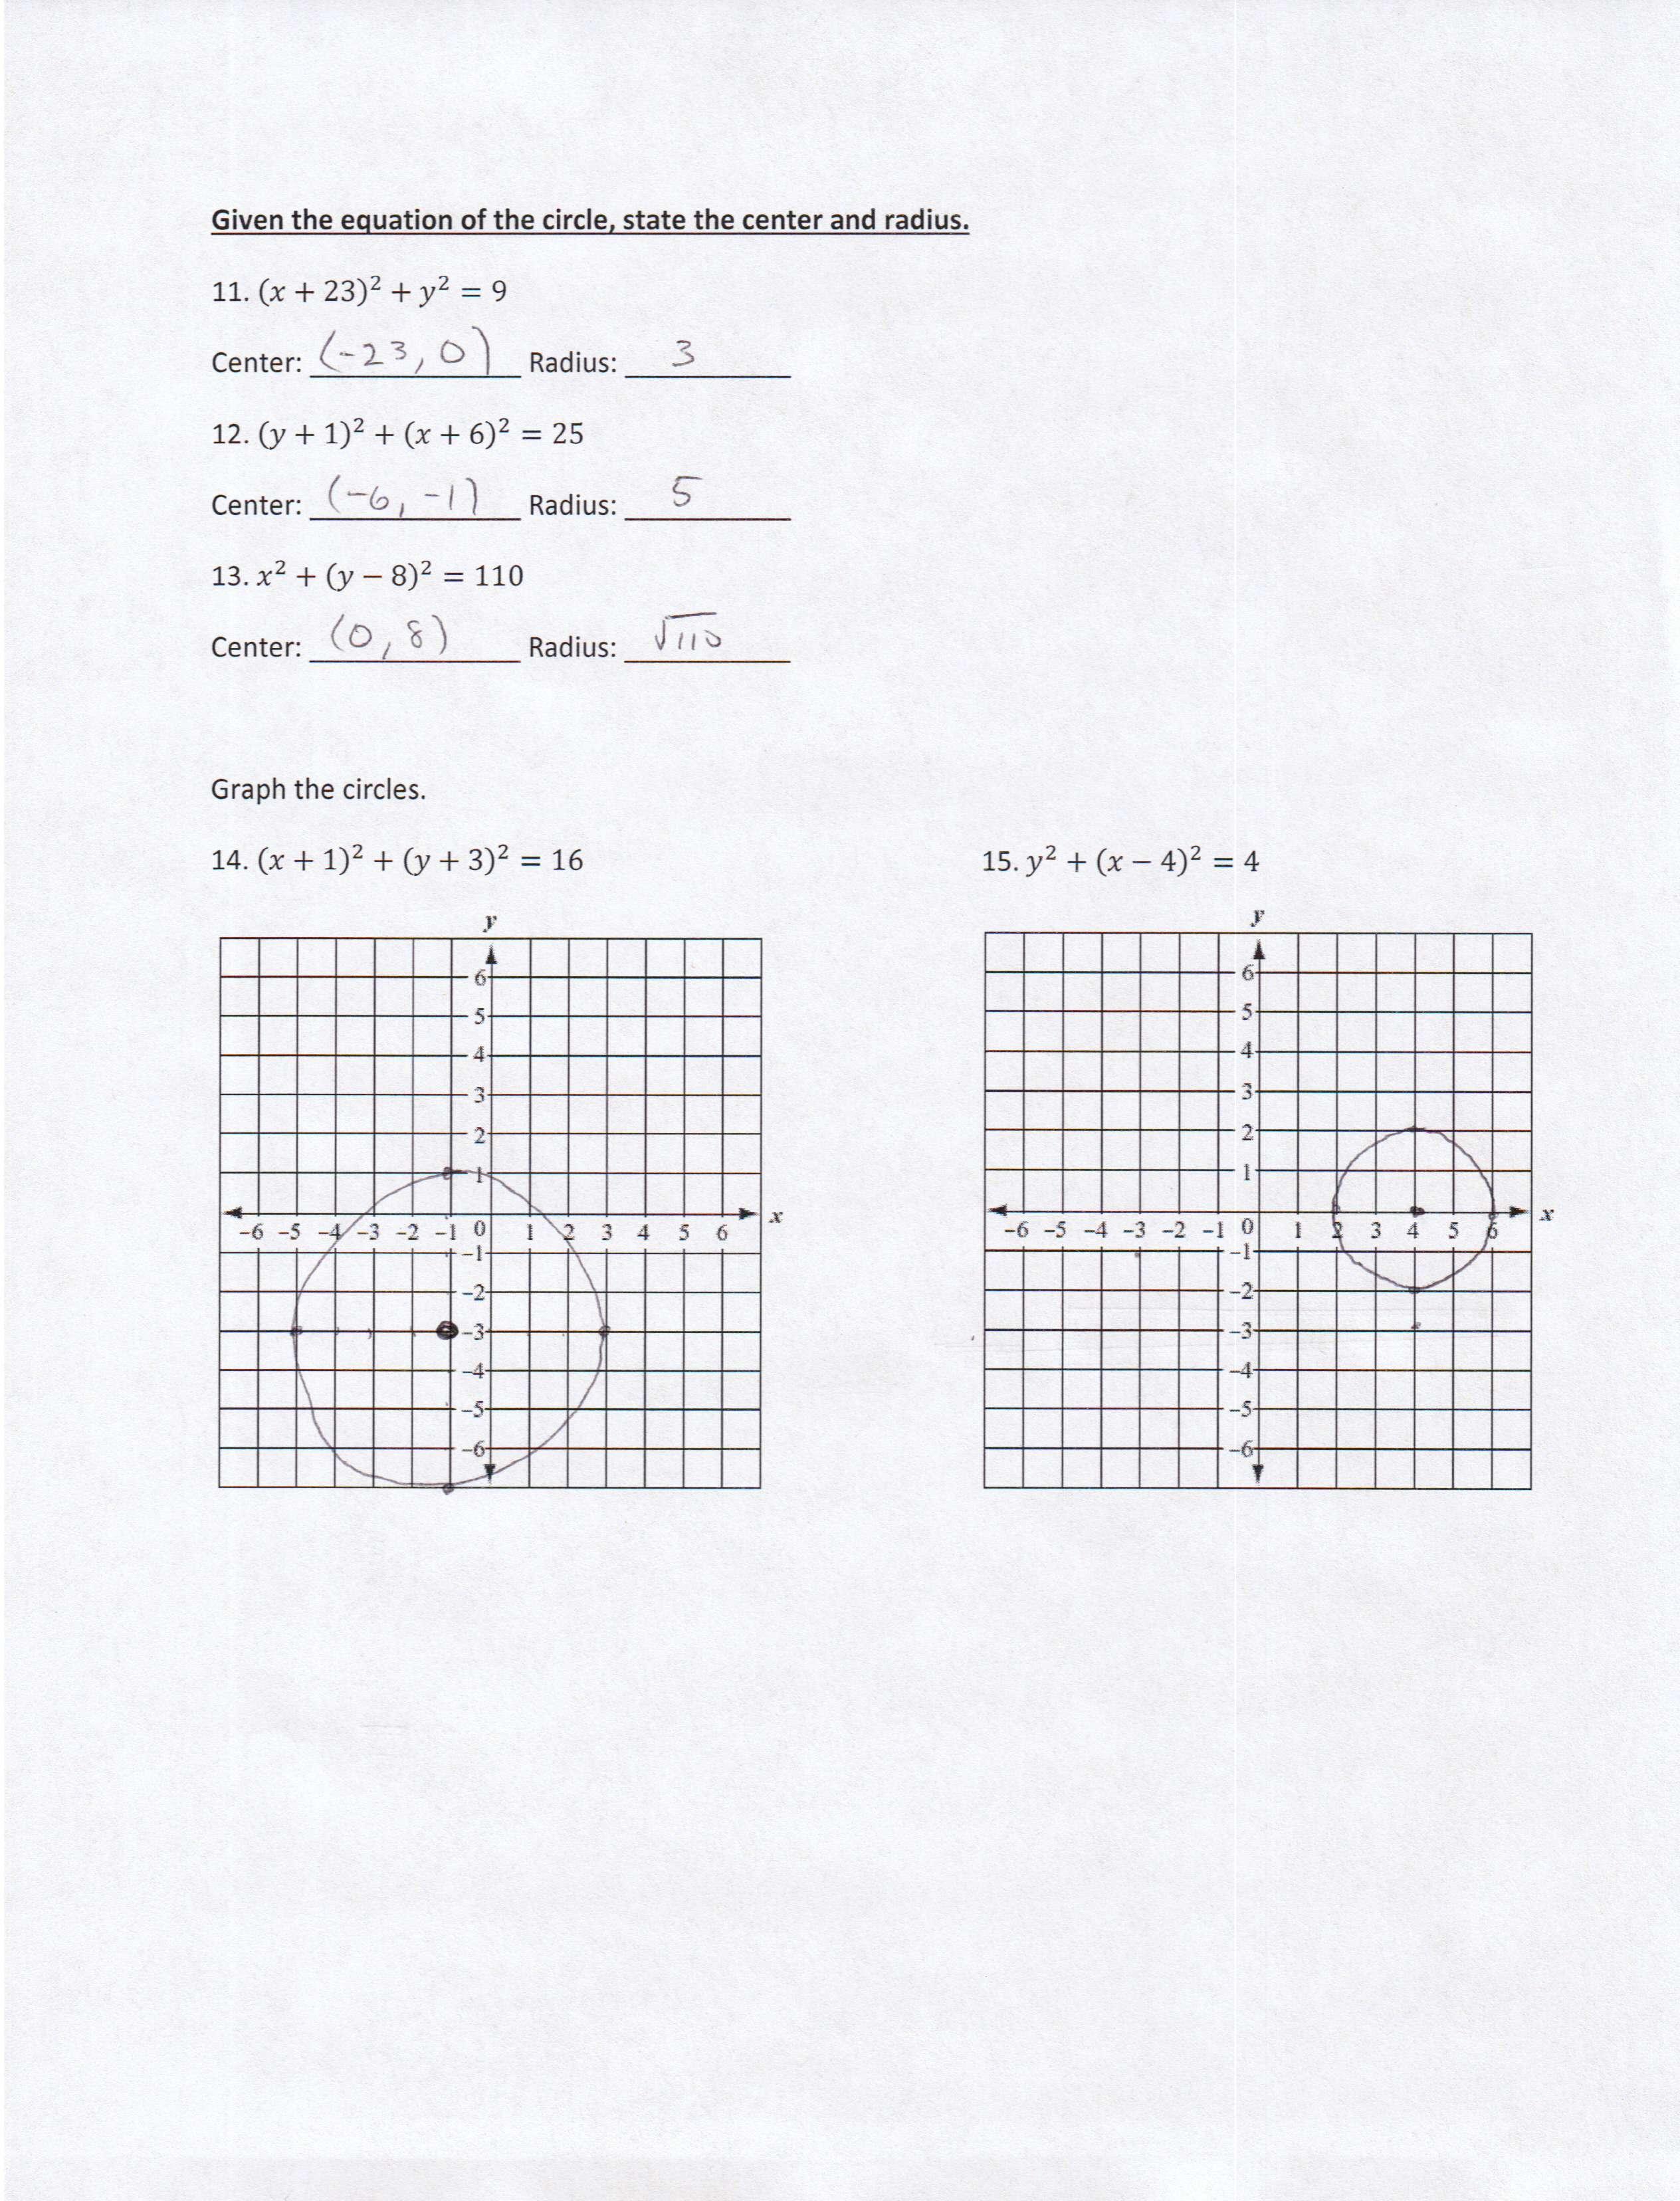 Algebra 2 PDFs — Mr. Deibel's Class